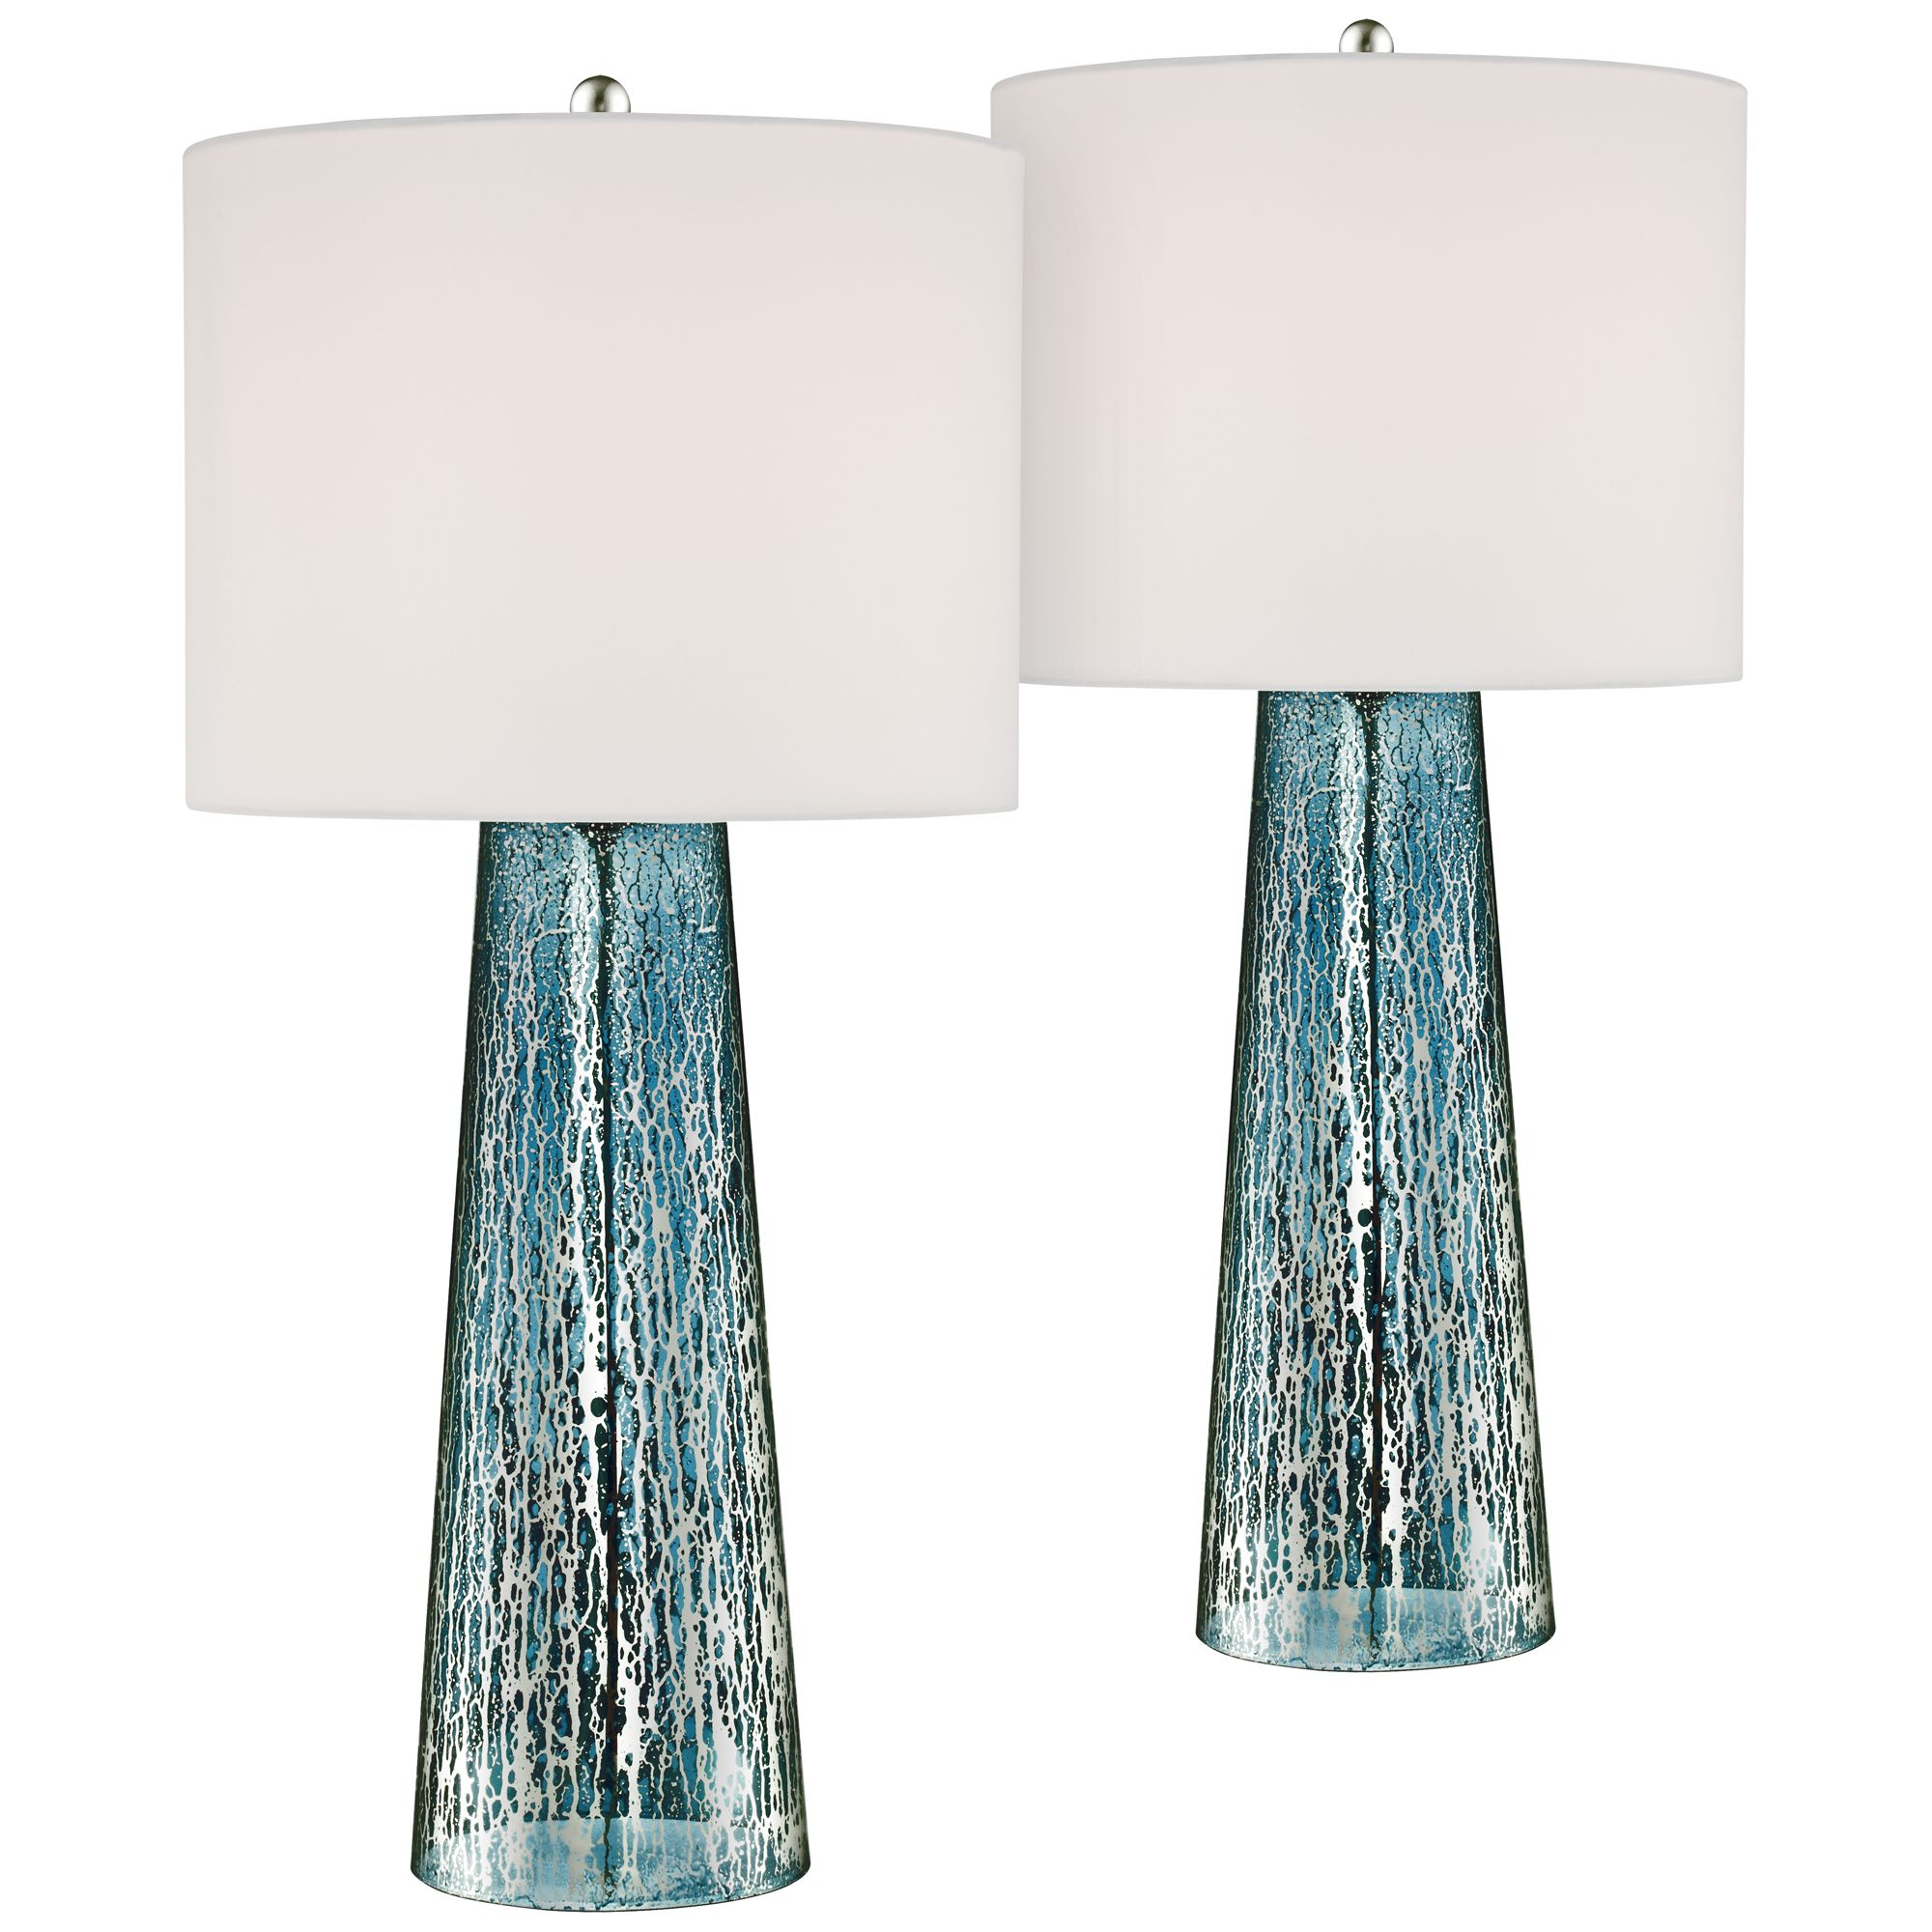 360 Lighting Coastal Table Lamps Set Of 2 Blue Mercury Glass Tapered